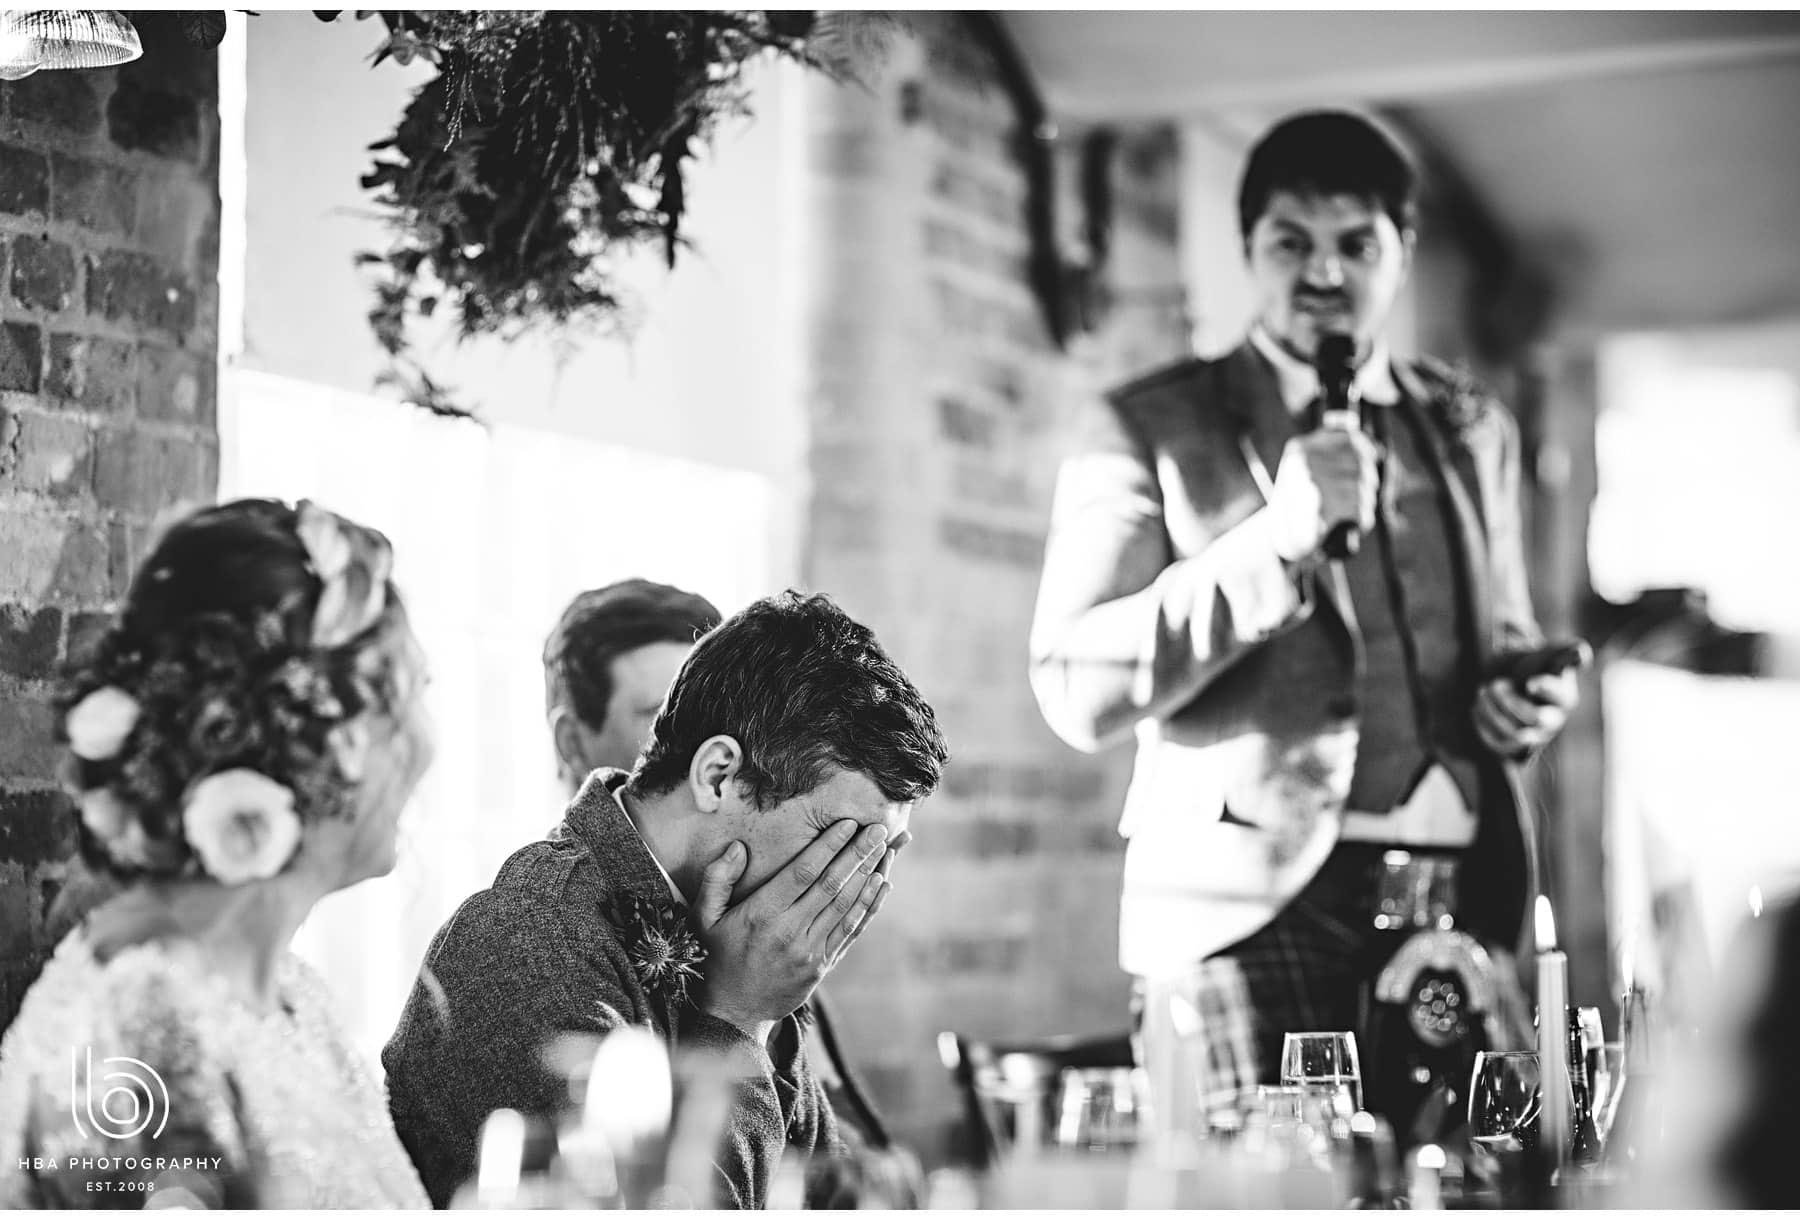 the best man embarrasing the groom